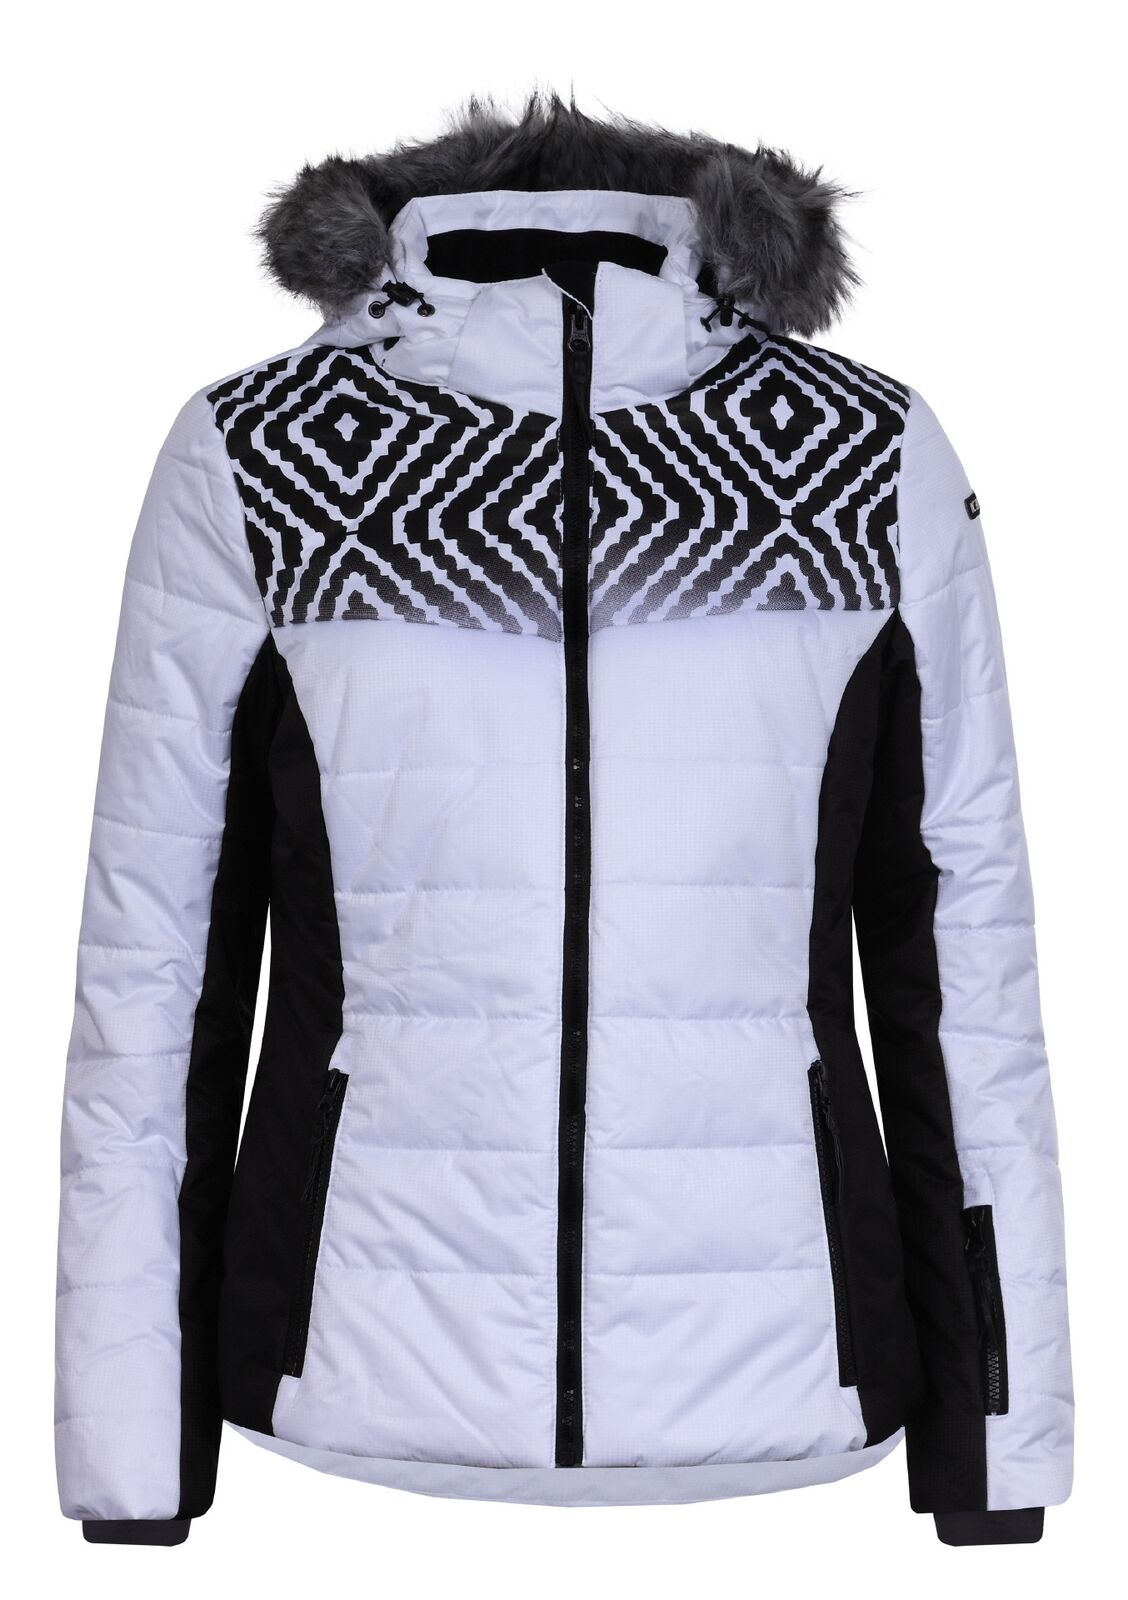 Icepeak VERUCA Damen Skijacke OPTIC Weiß